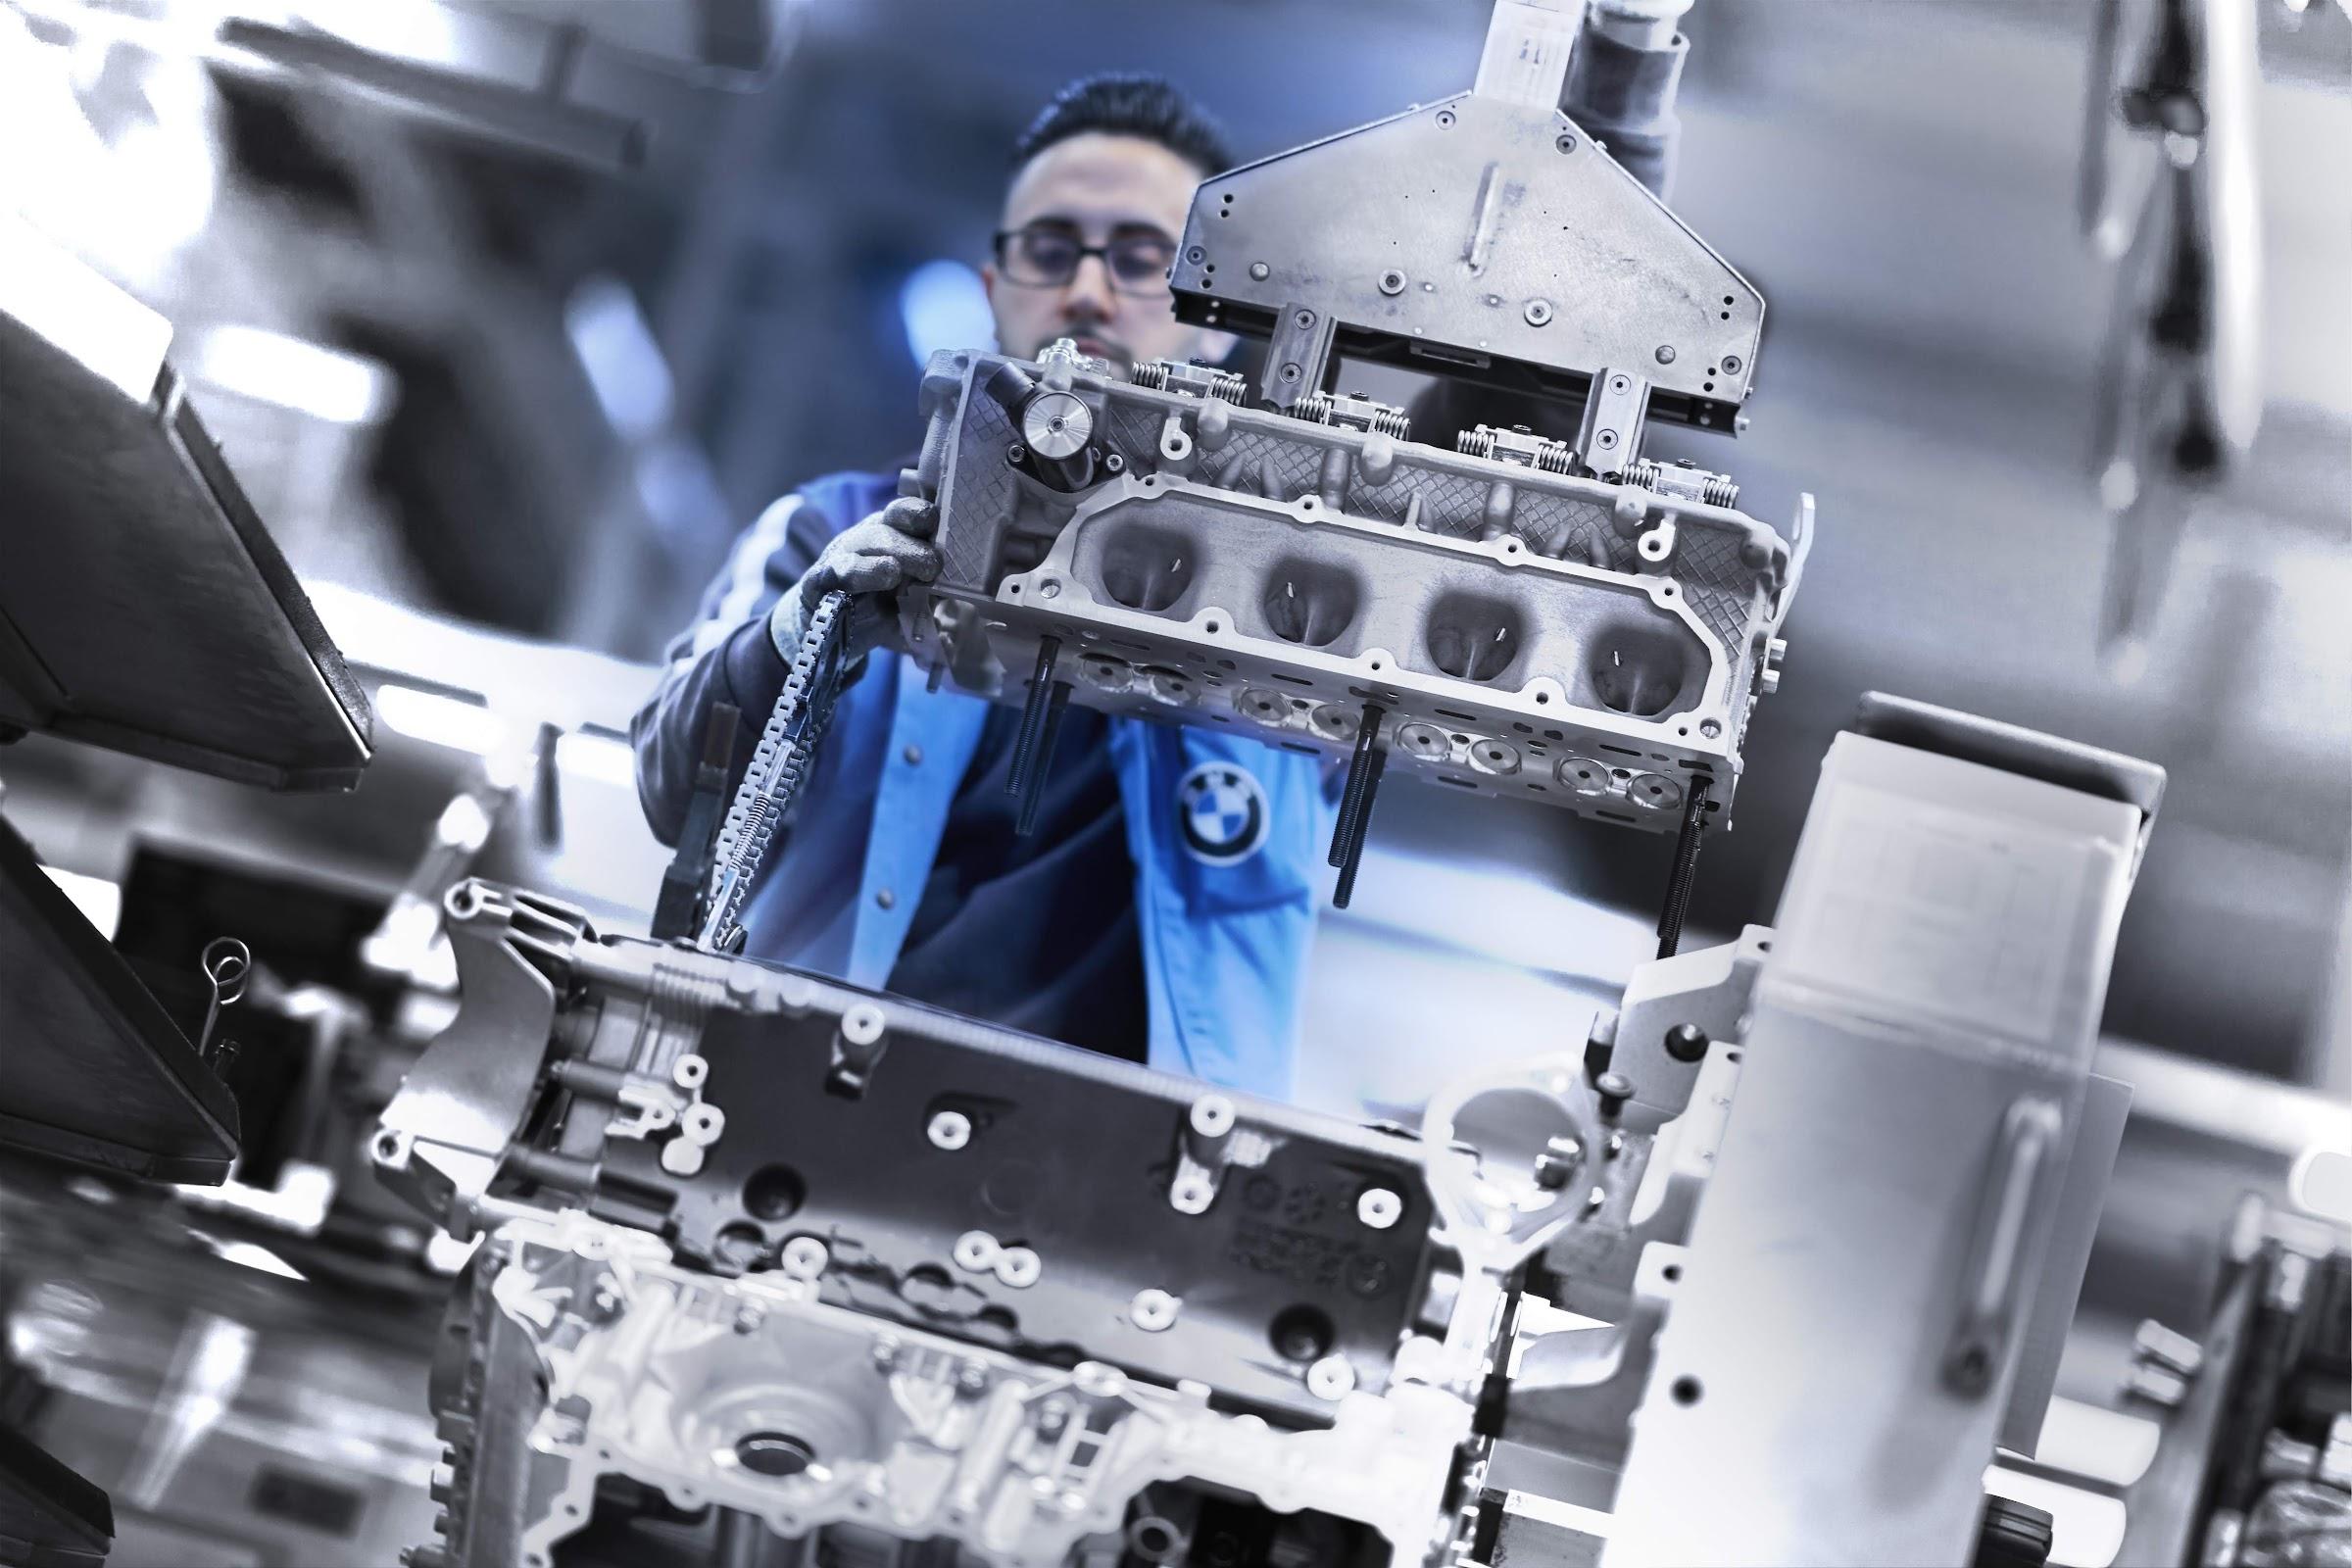 JnrmRrR5fntlQMWgLi75msNSwnap1J1ONatJ6PTwJFbP FjzbsYe5cib0jV64VJZzOK B8JCPuOohwn9P908zzn7Gnzu3 fmvZOf06TiFT2d8HCc QPLFF8qtRqymn4ig80IGuVgg=w2400 - Así es el montaje del motor V8 del BMW Serie 8 Coupé